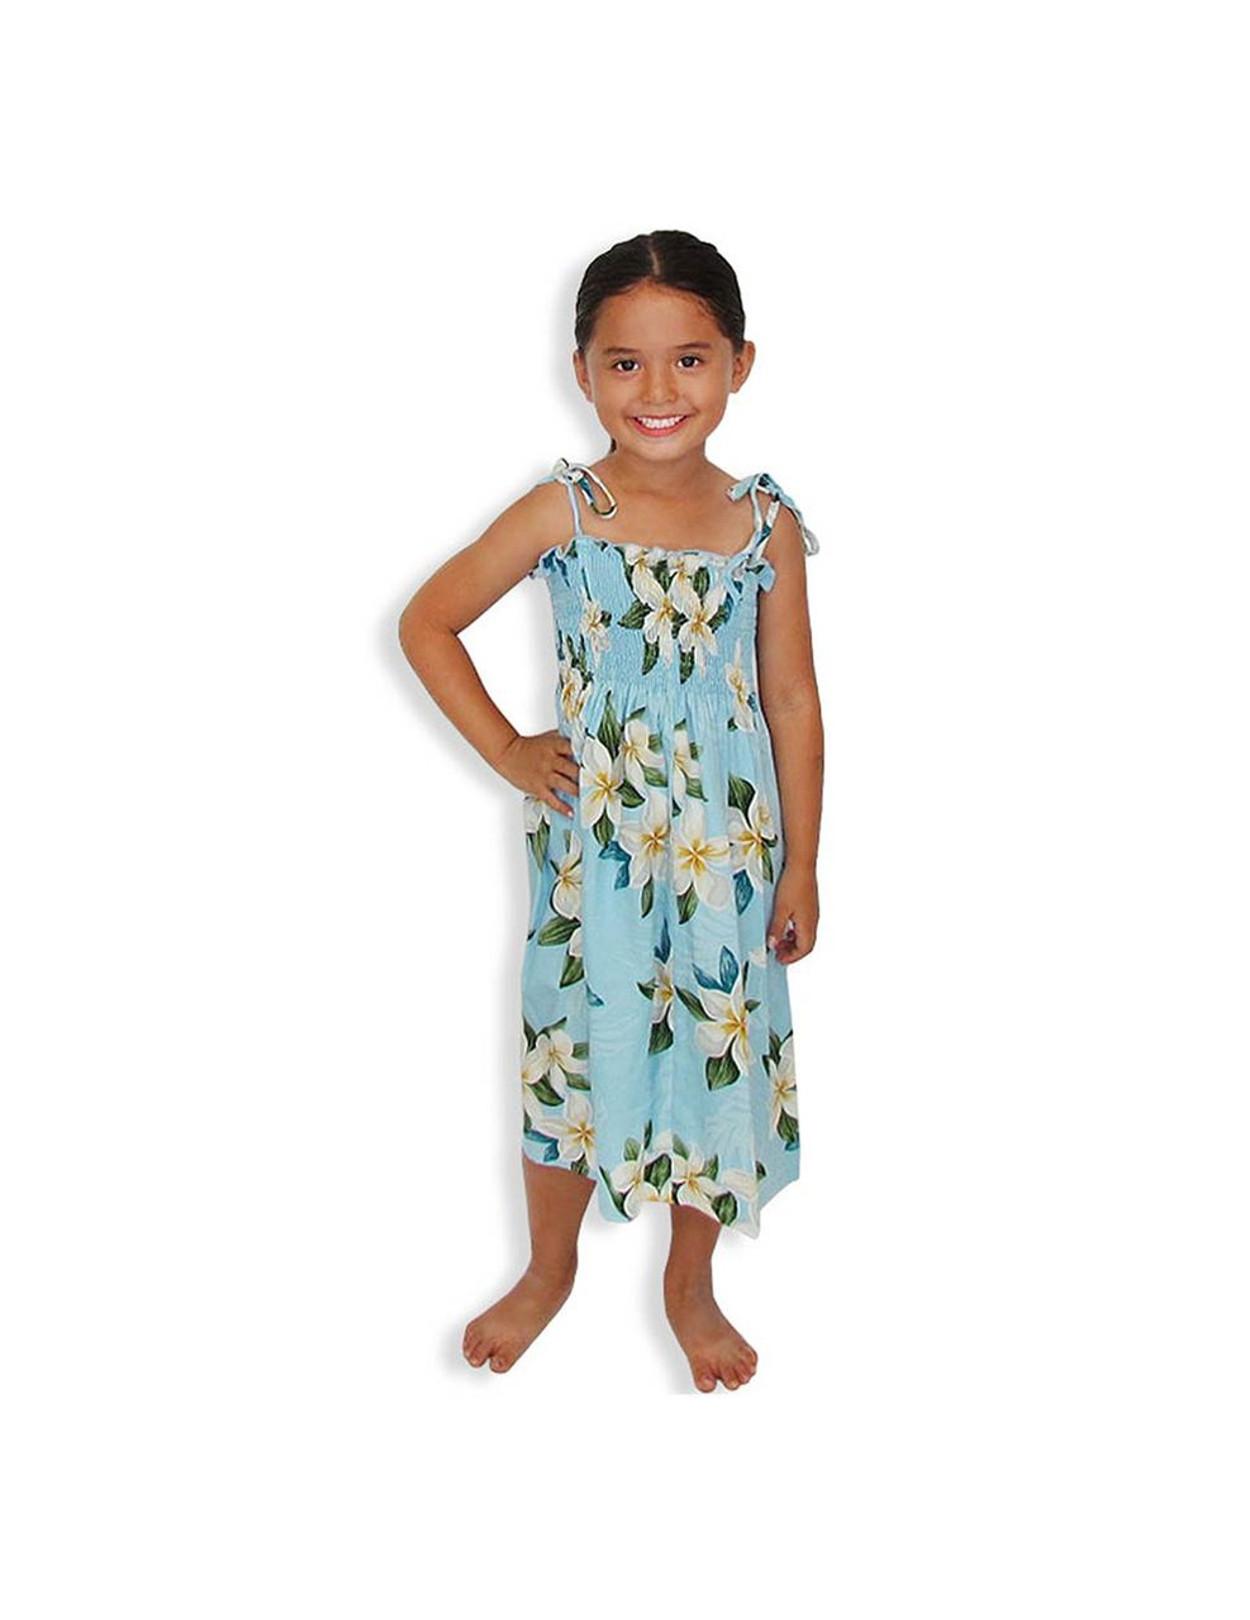 c2f71553abb Girl s Tube Top Dress - Plumeria Sky 100% Rayon Fabric Color  Blue One Size